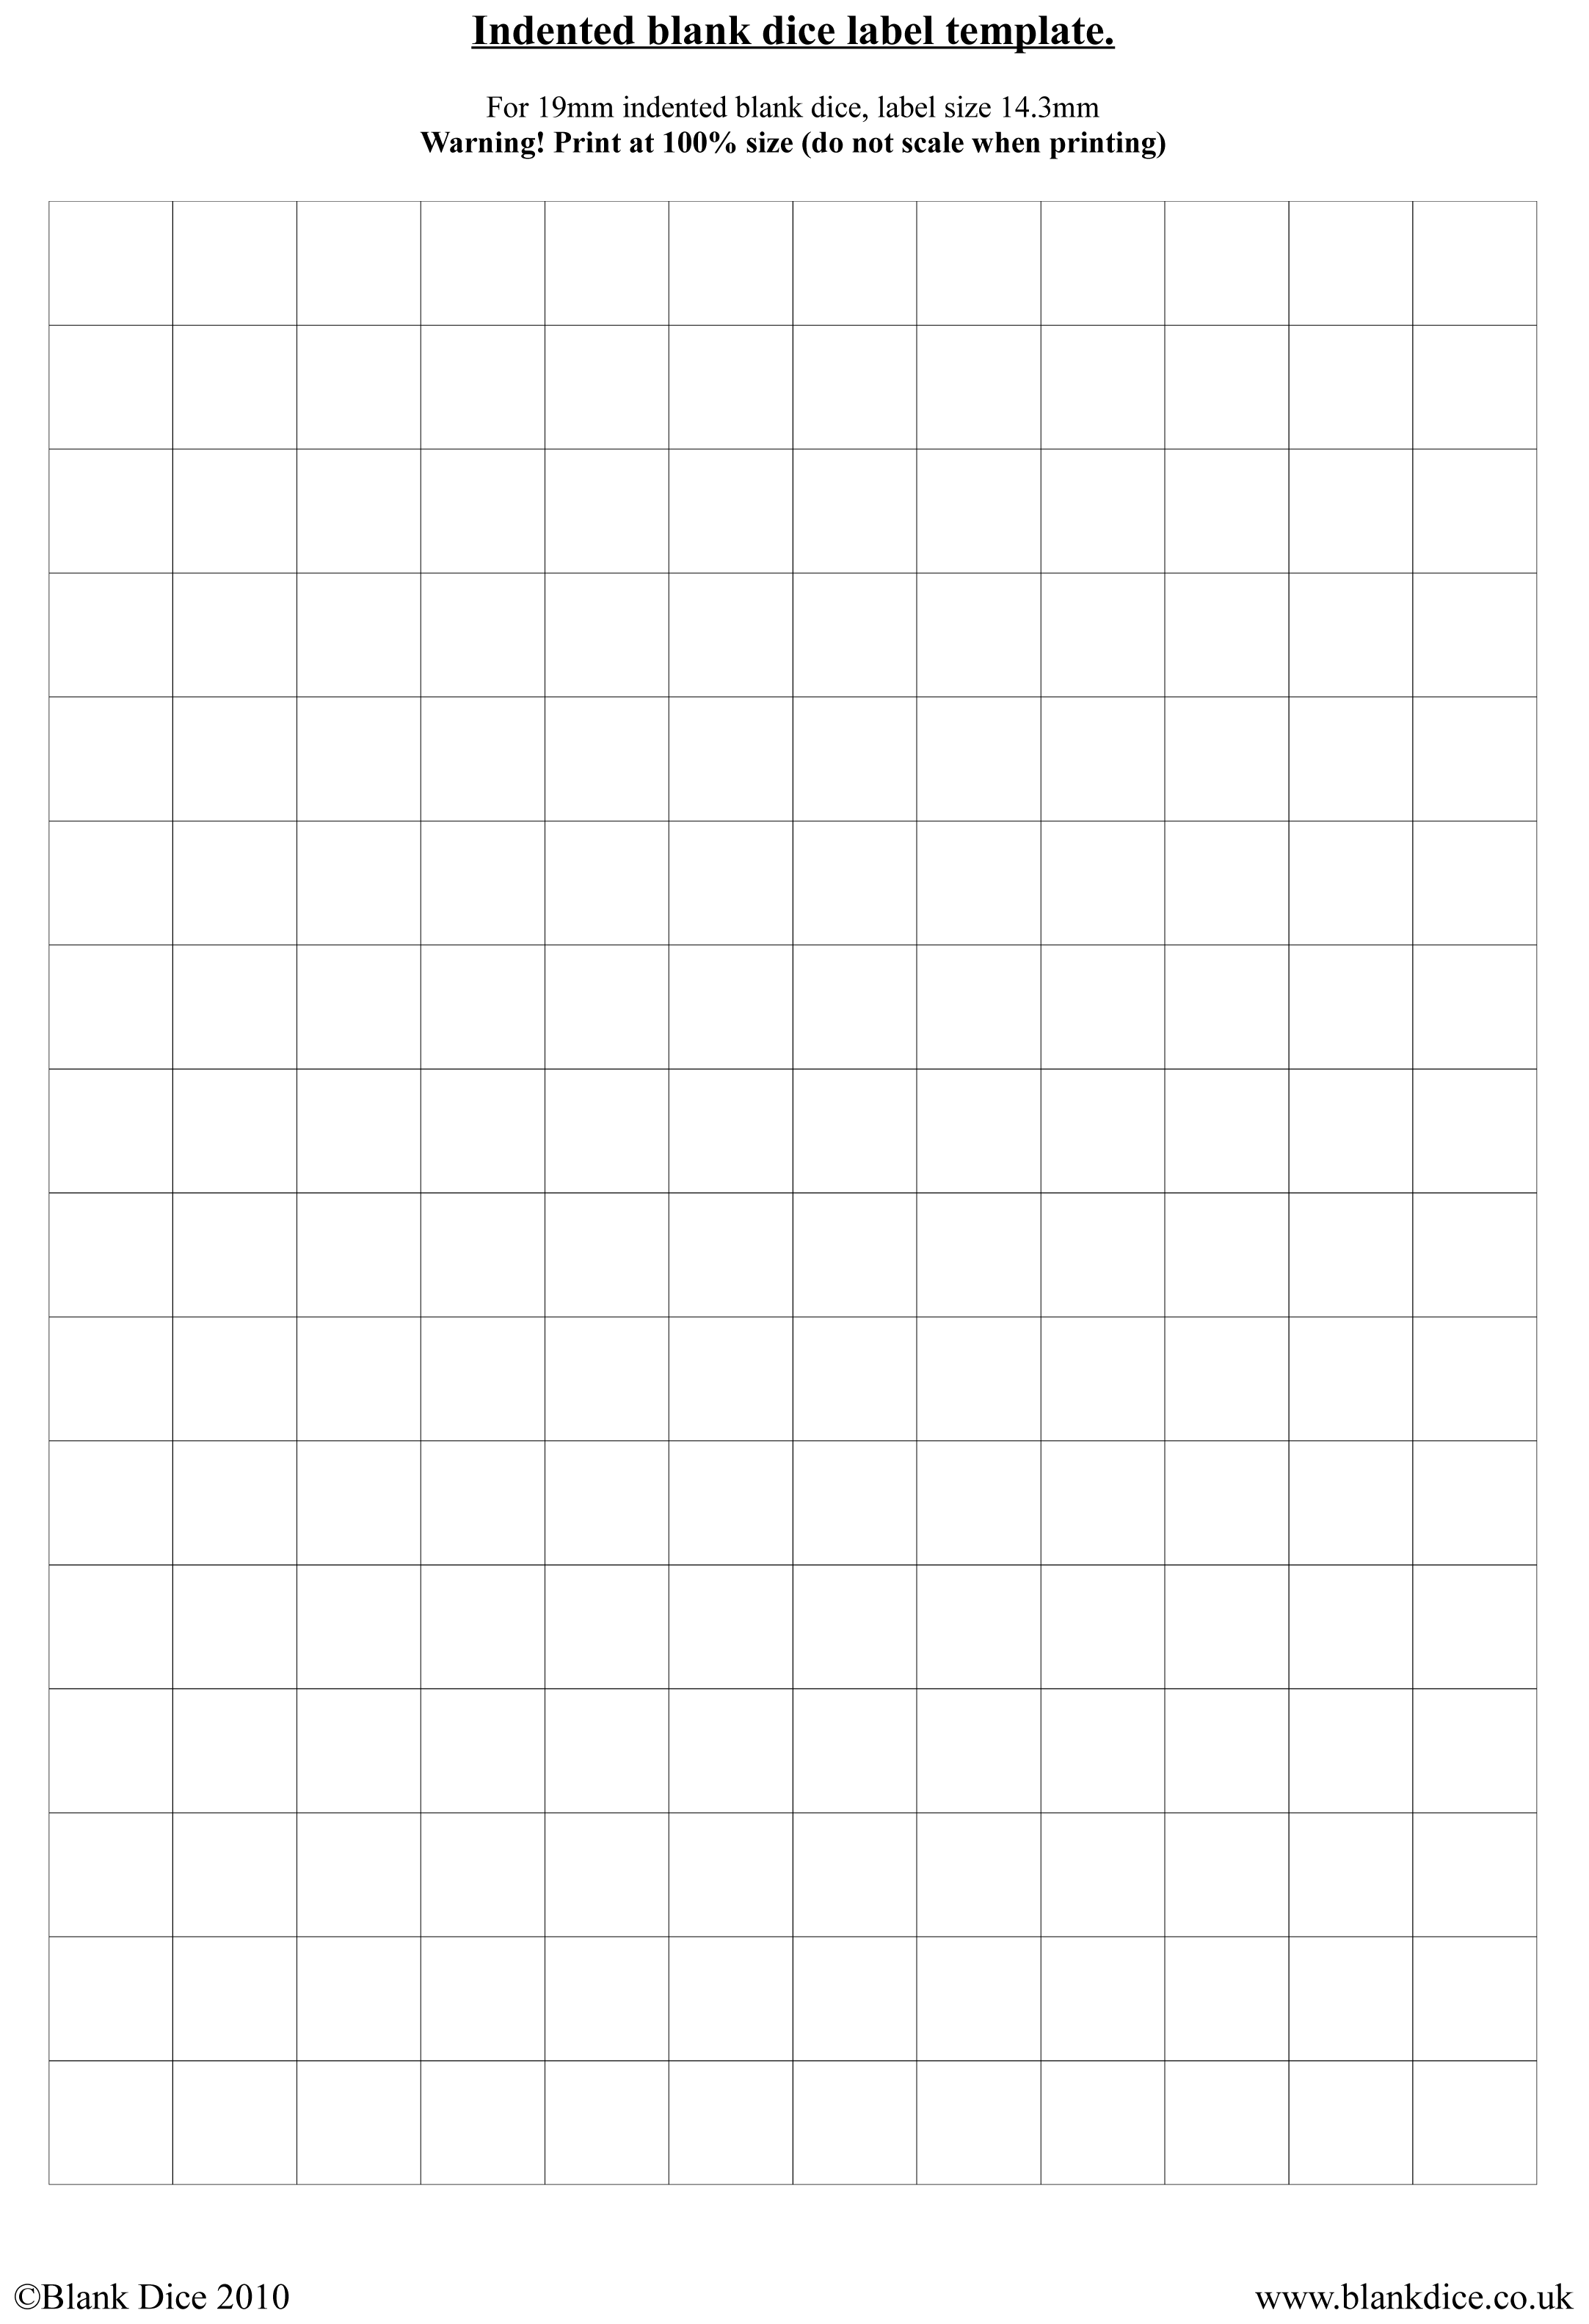 Blank dice templates